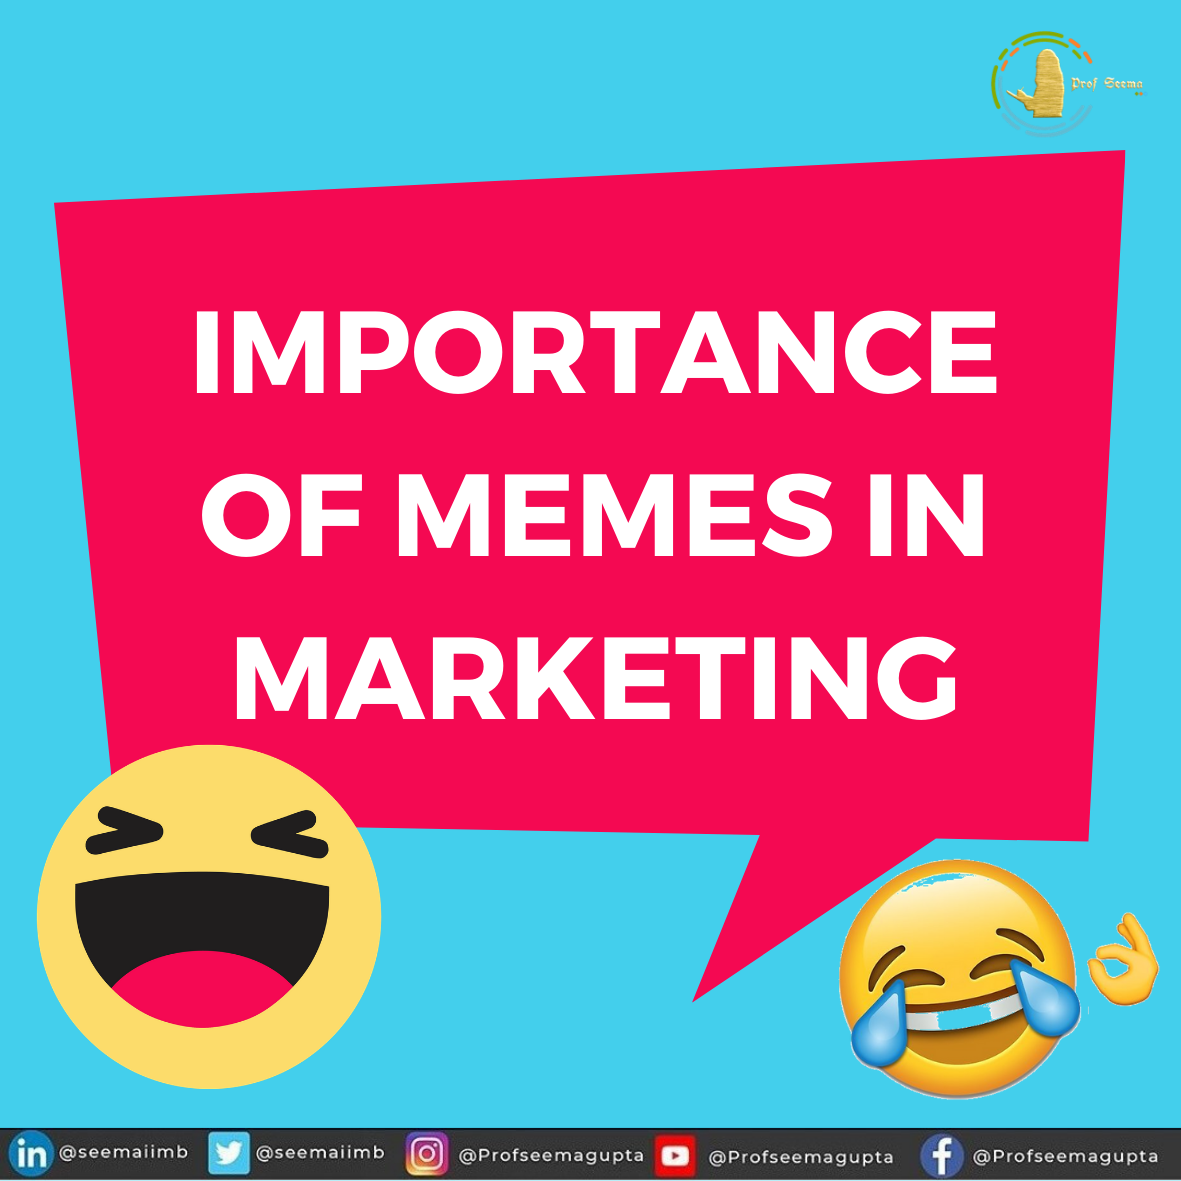 Importance Of Memes In Marketing Memes You Meme Marketing